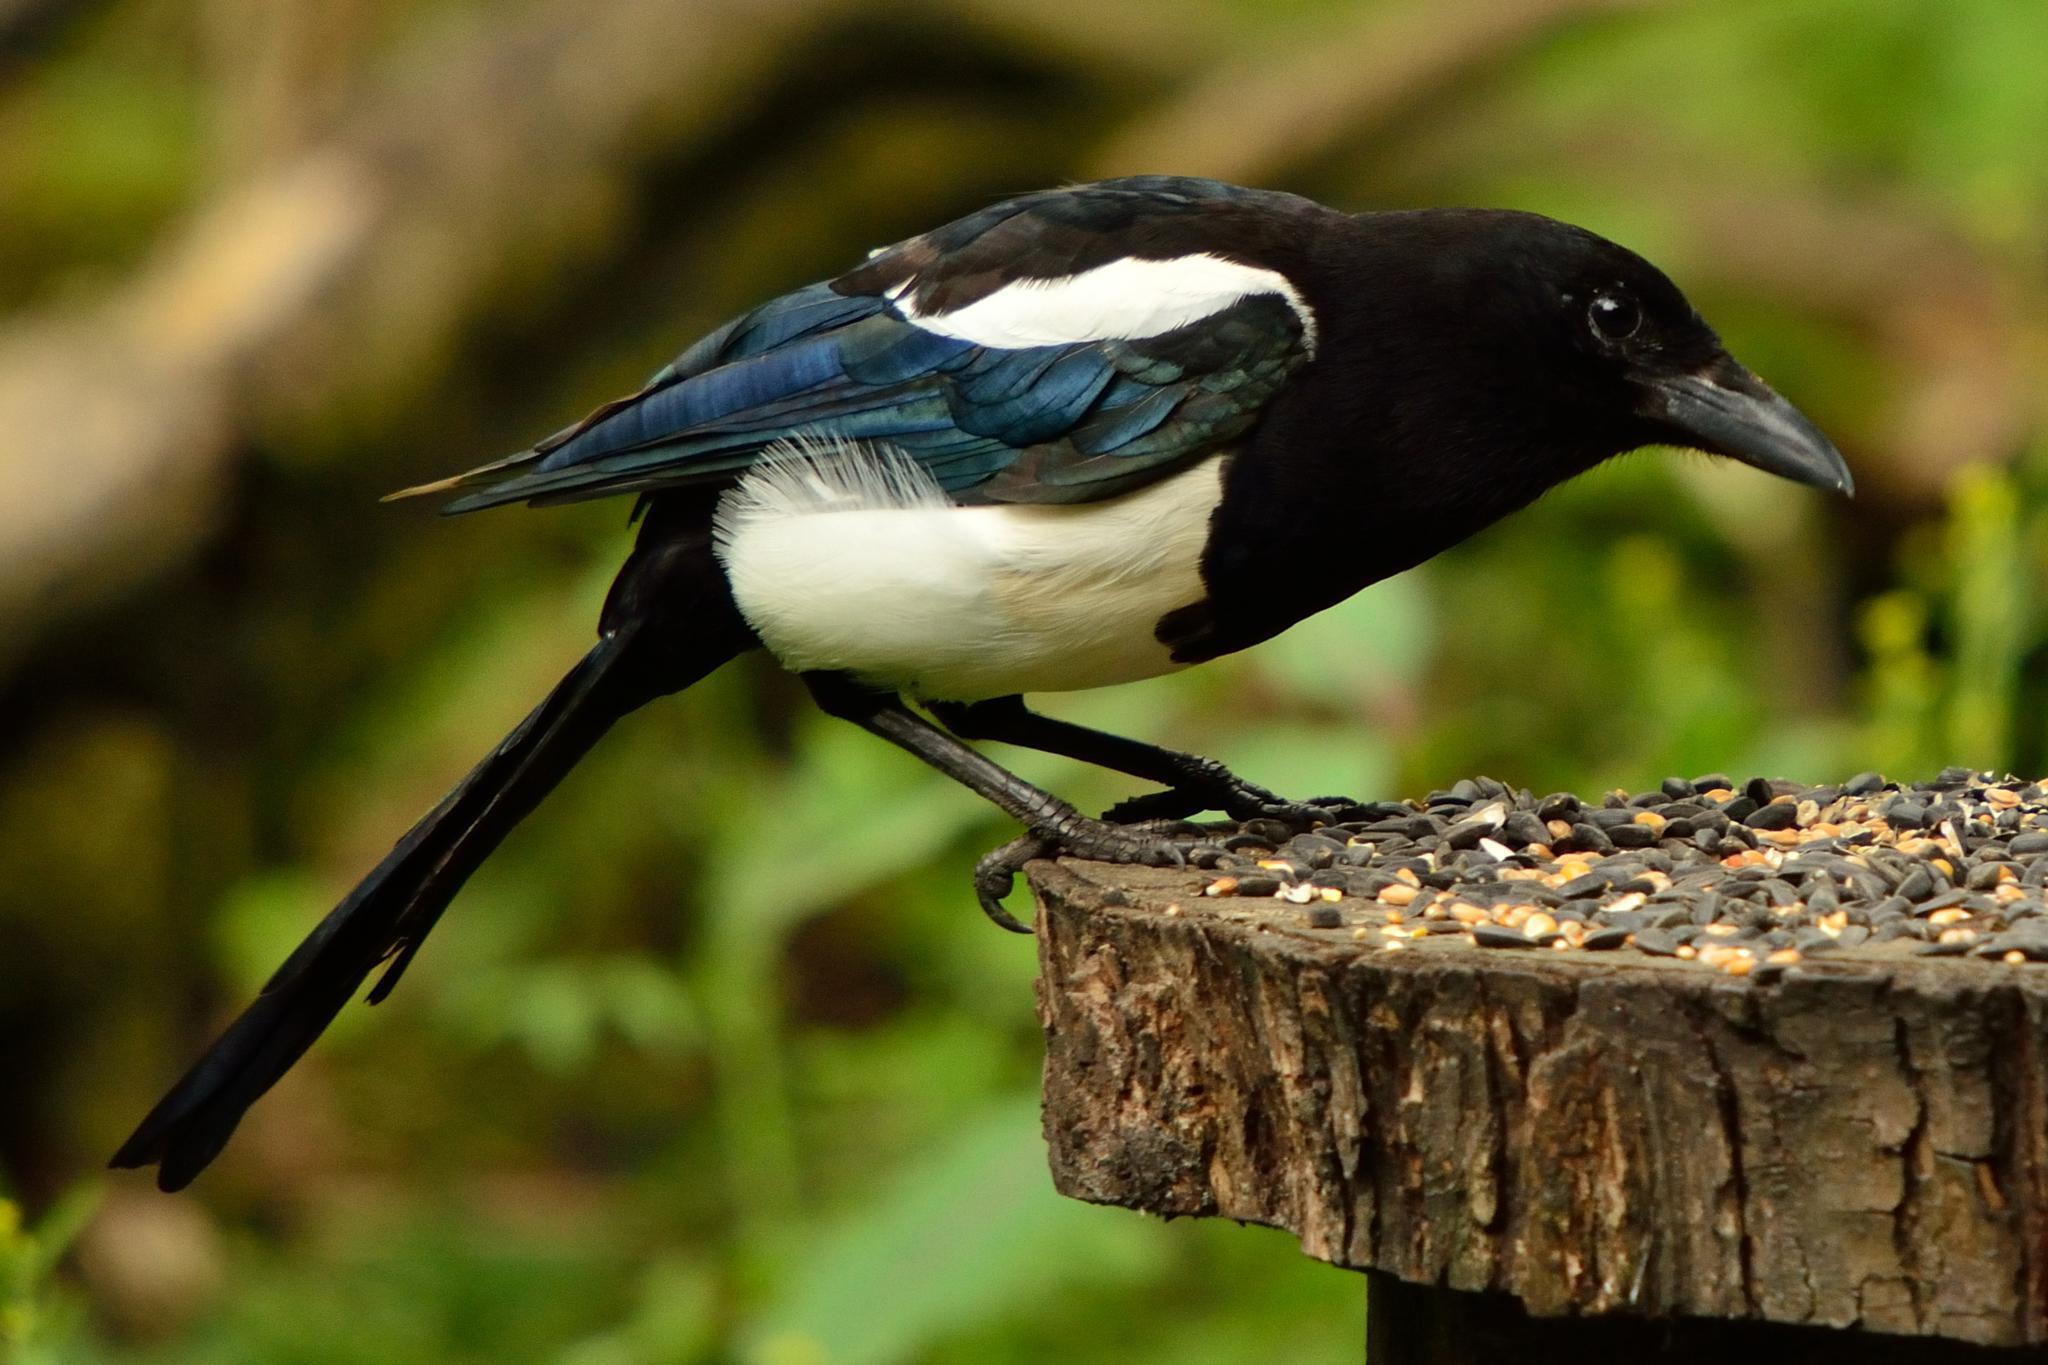 Magpie by Steve Rawlings